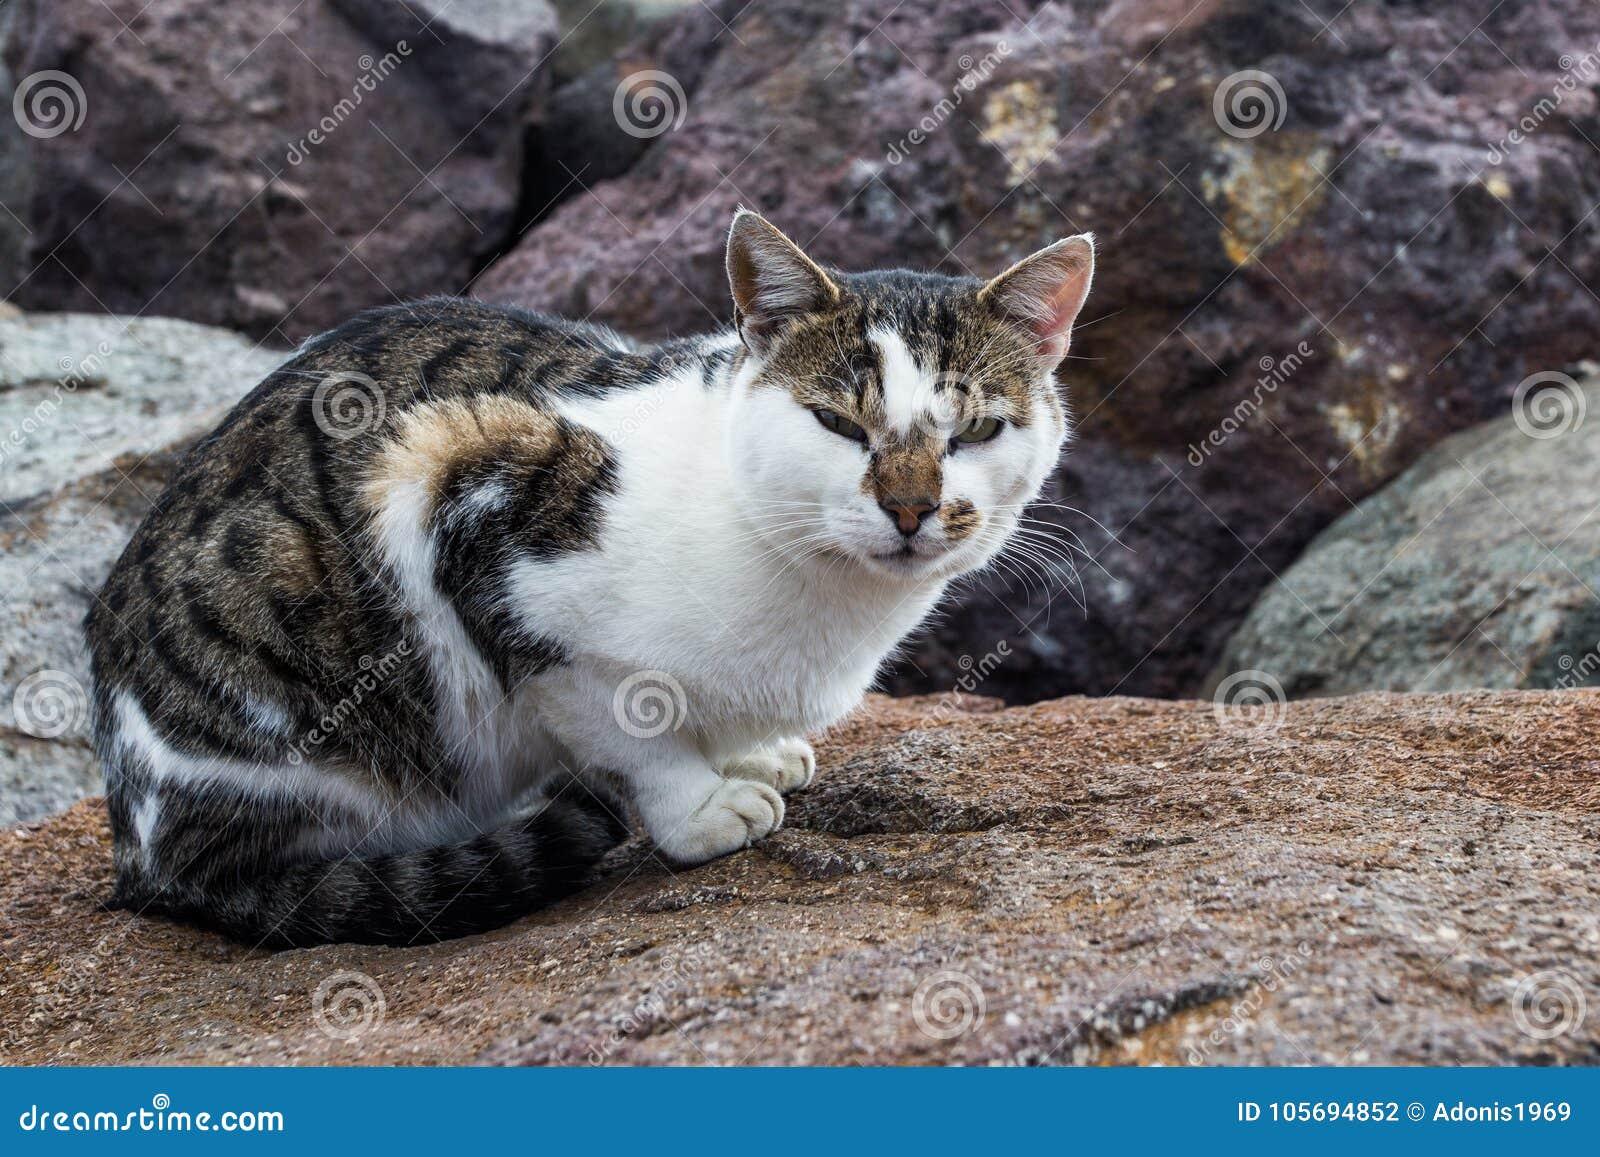 Gato de gato atigrado en roca